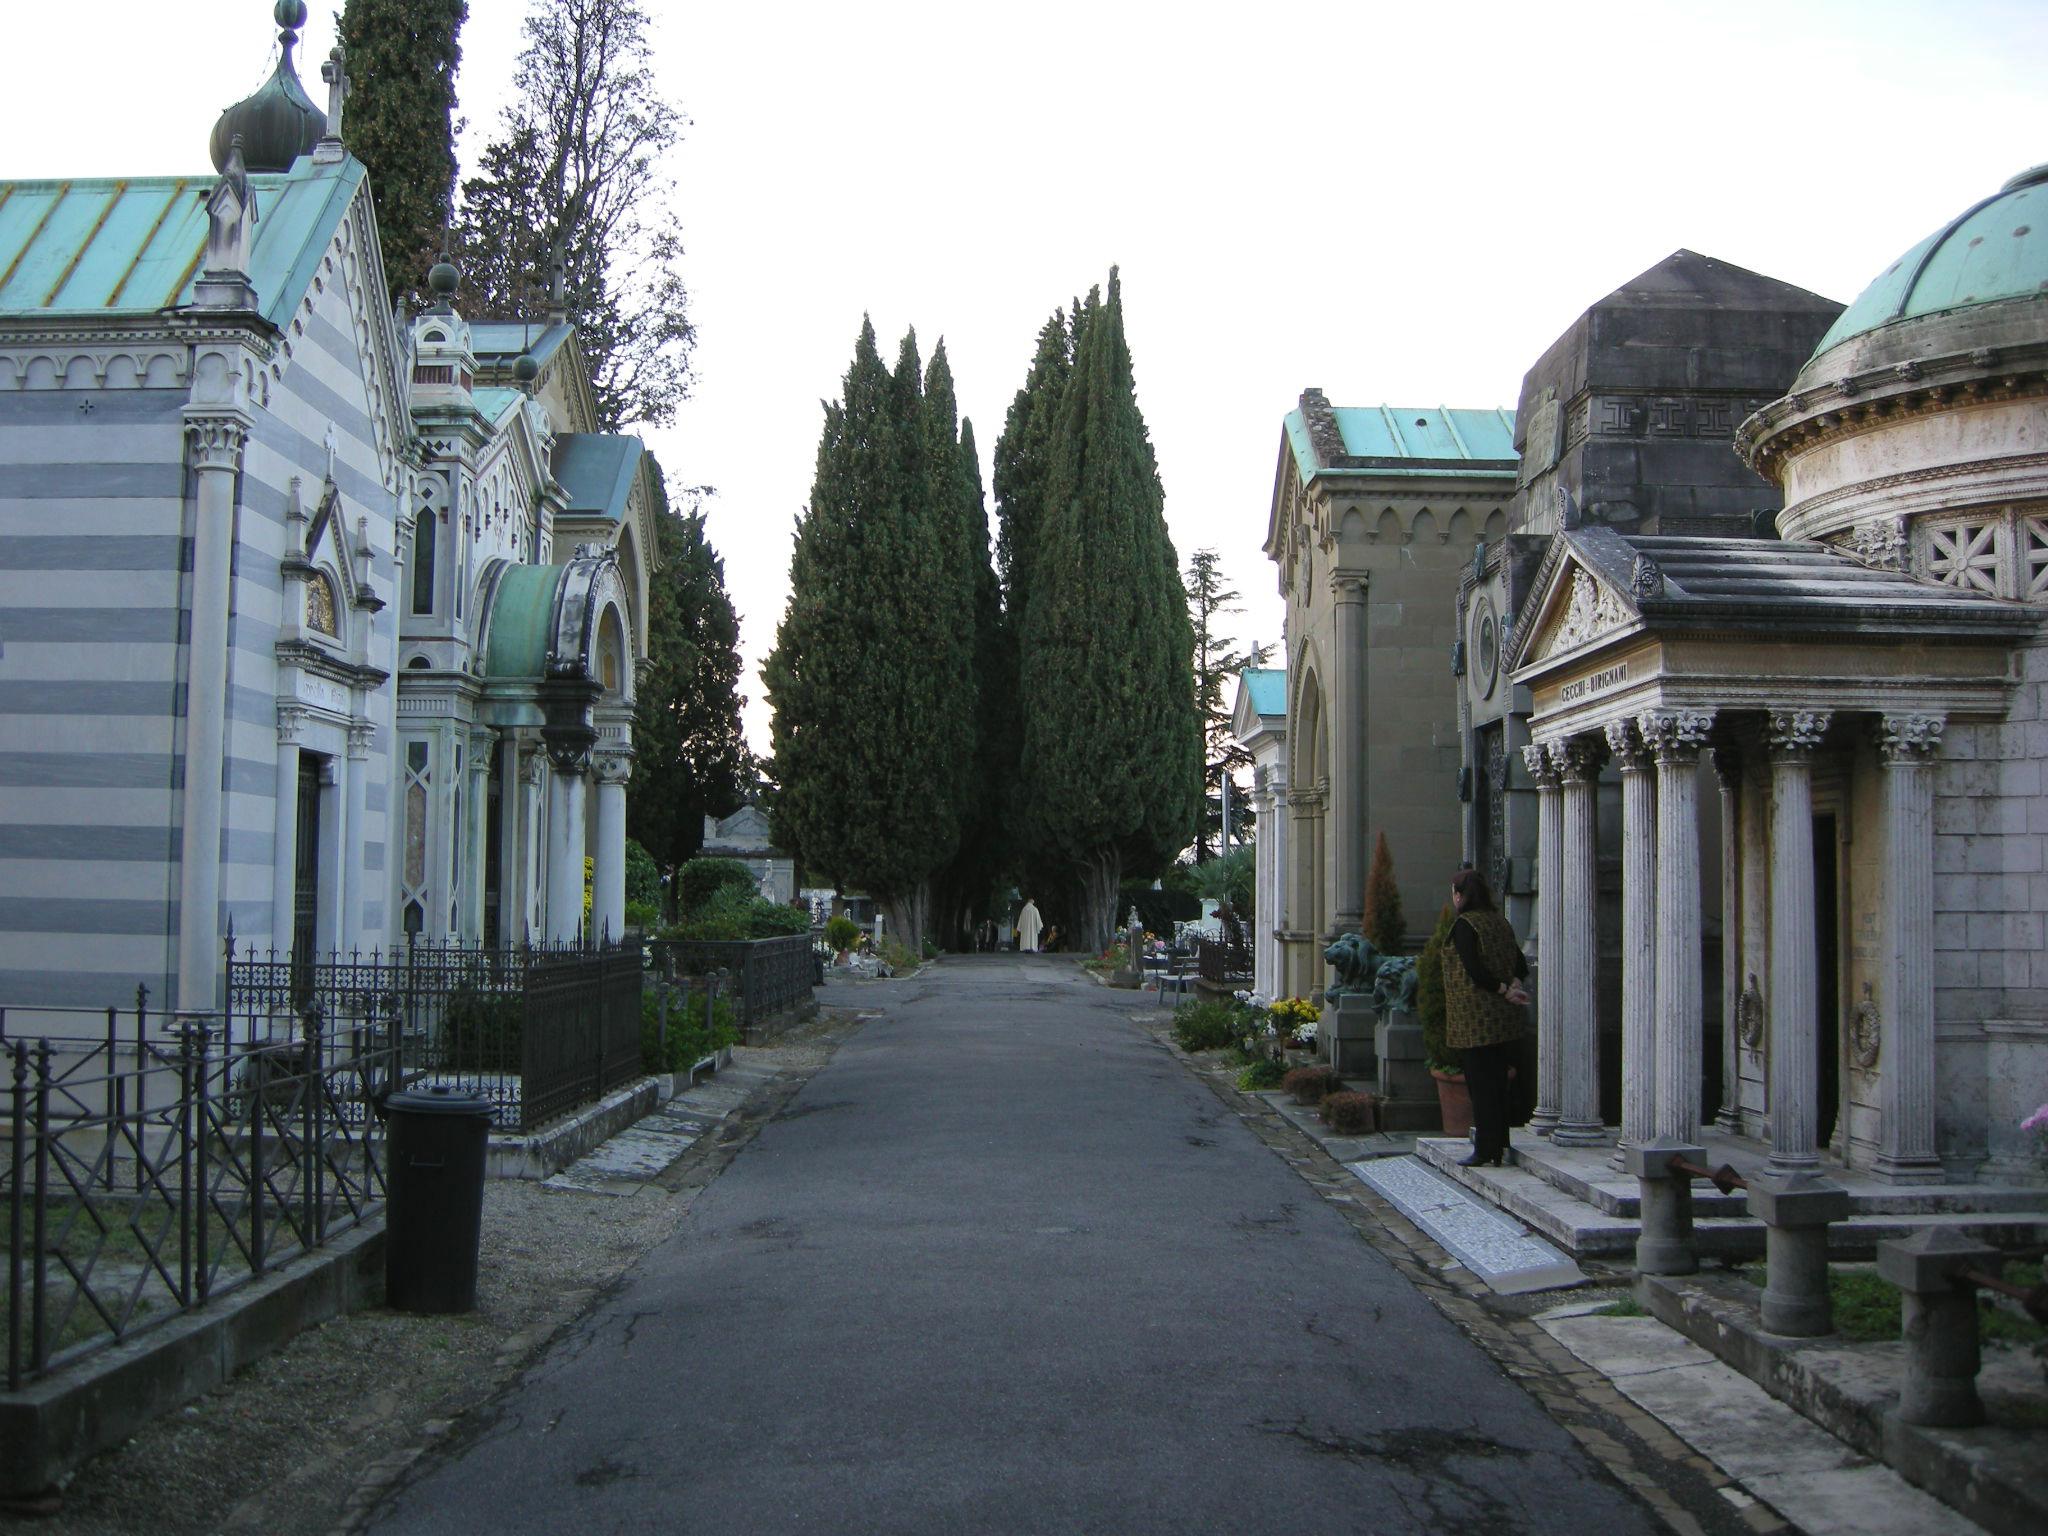 Cimitero delle porte sante 09.JPG